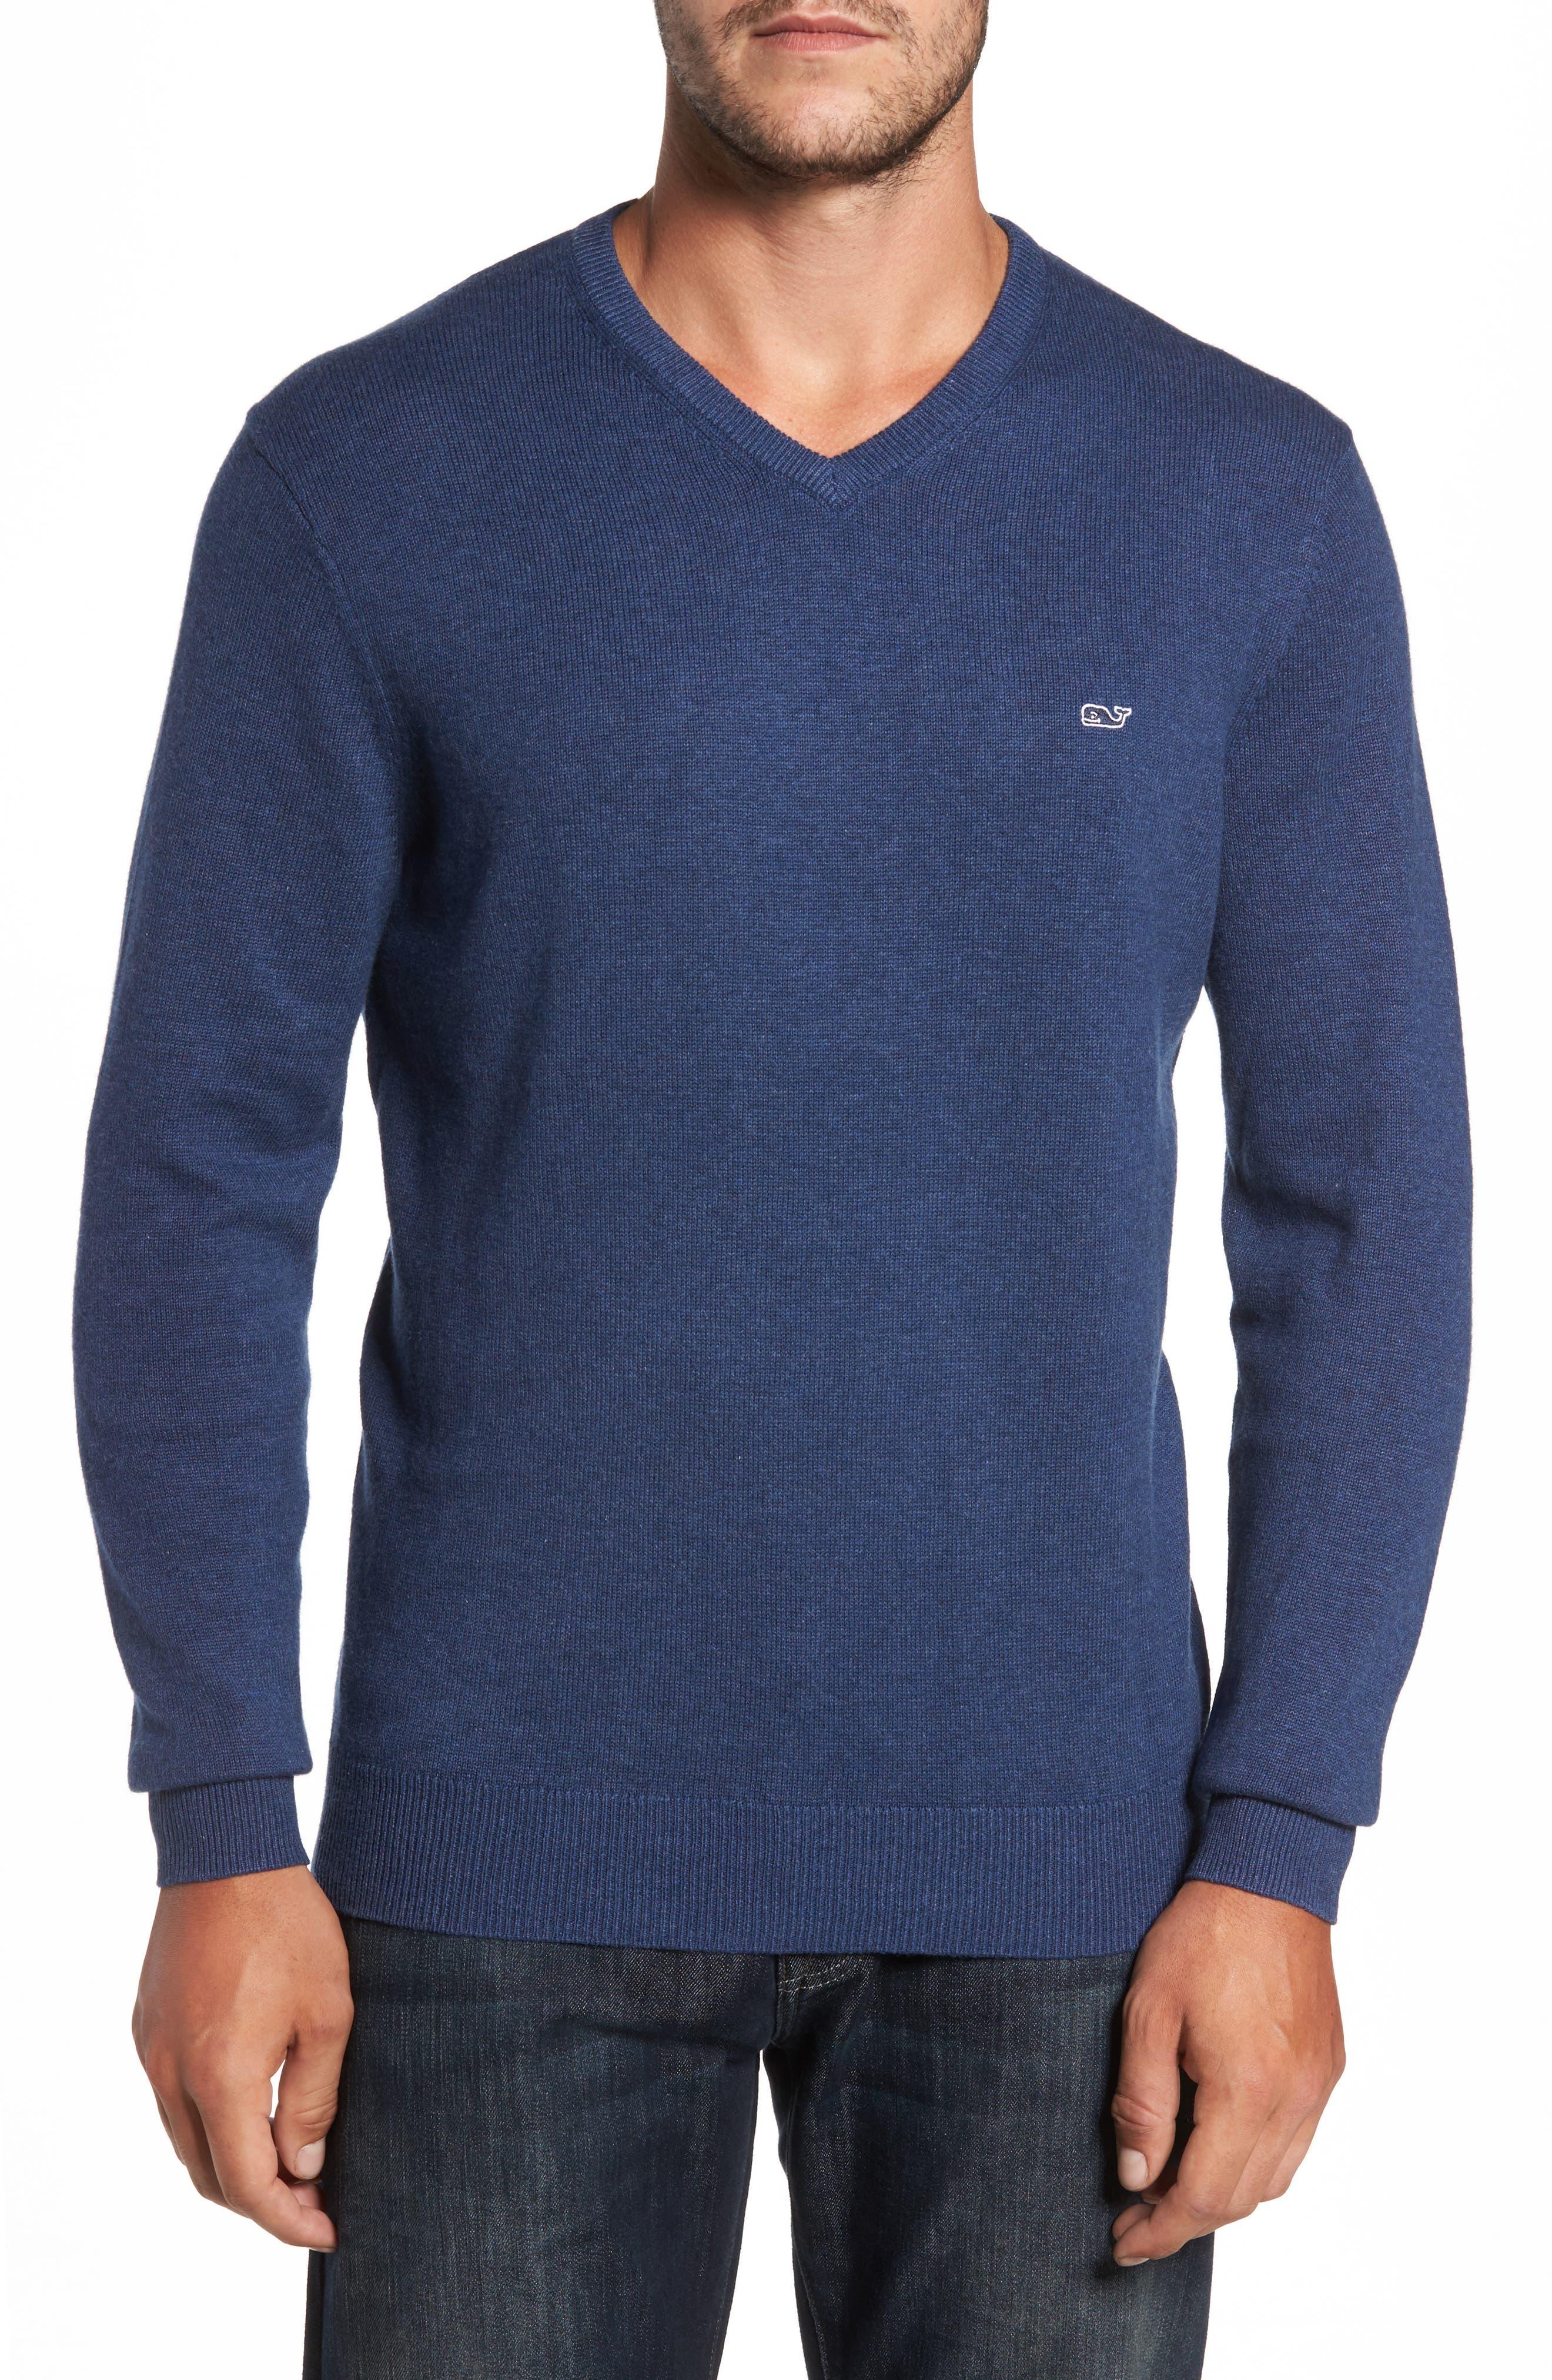 Vineyard Vines Lightweight Heathered Sweater